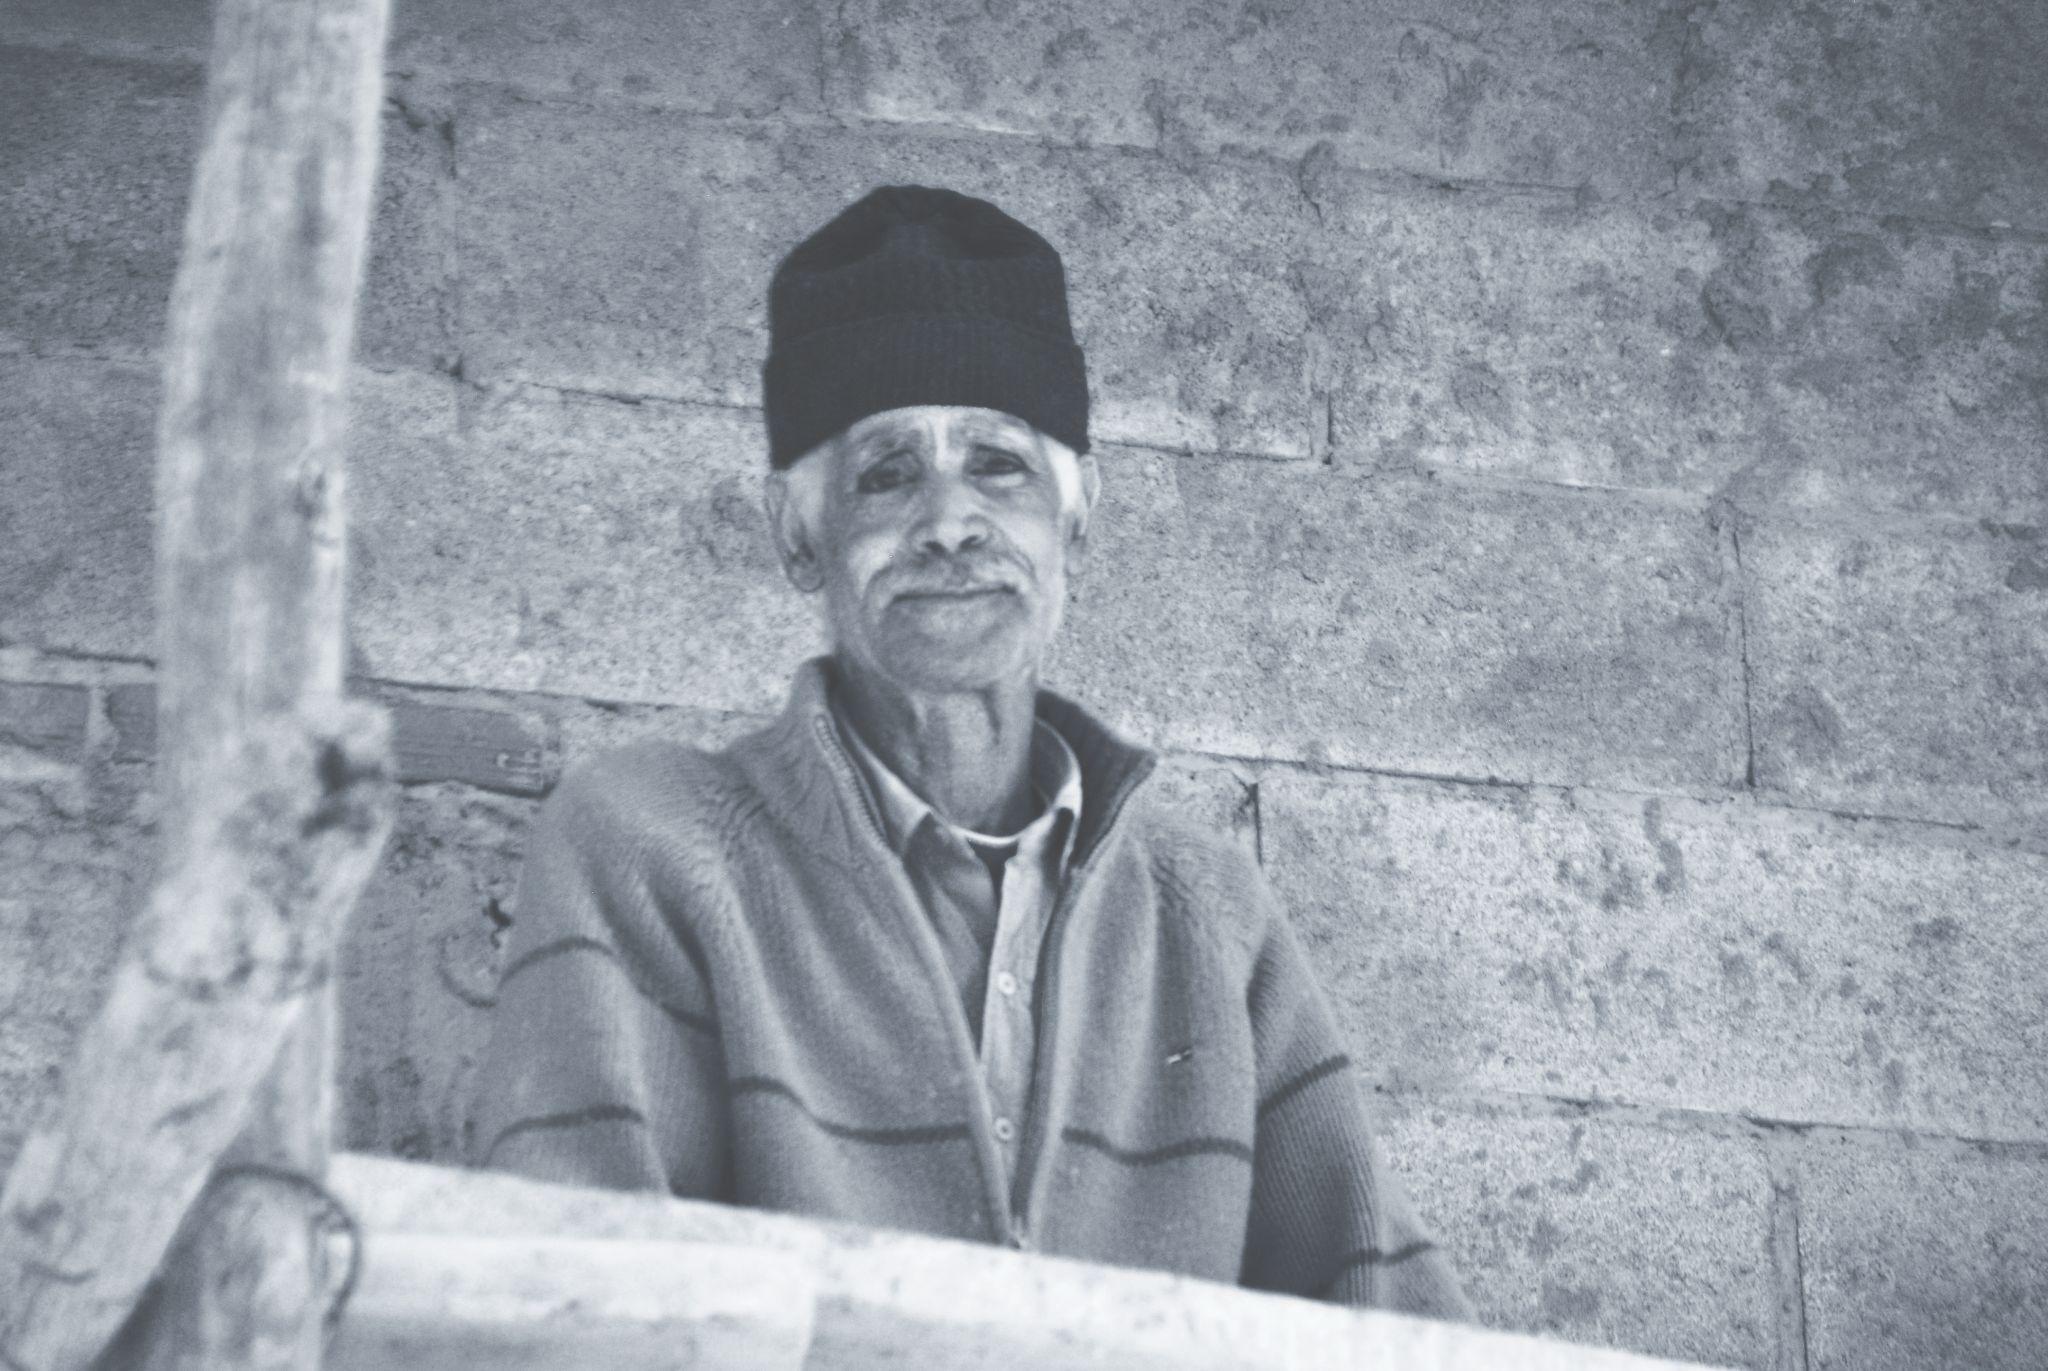 One look, million words.  by Khalil Kcm Marouf